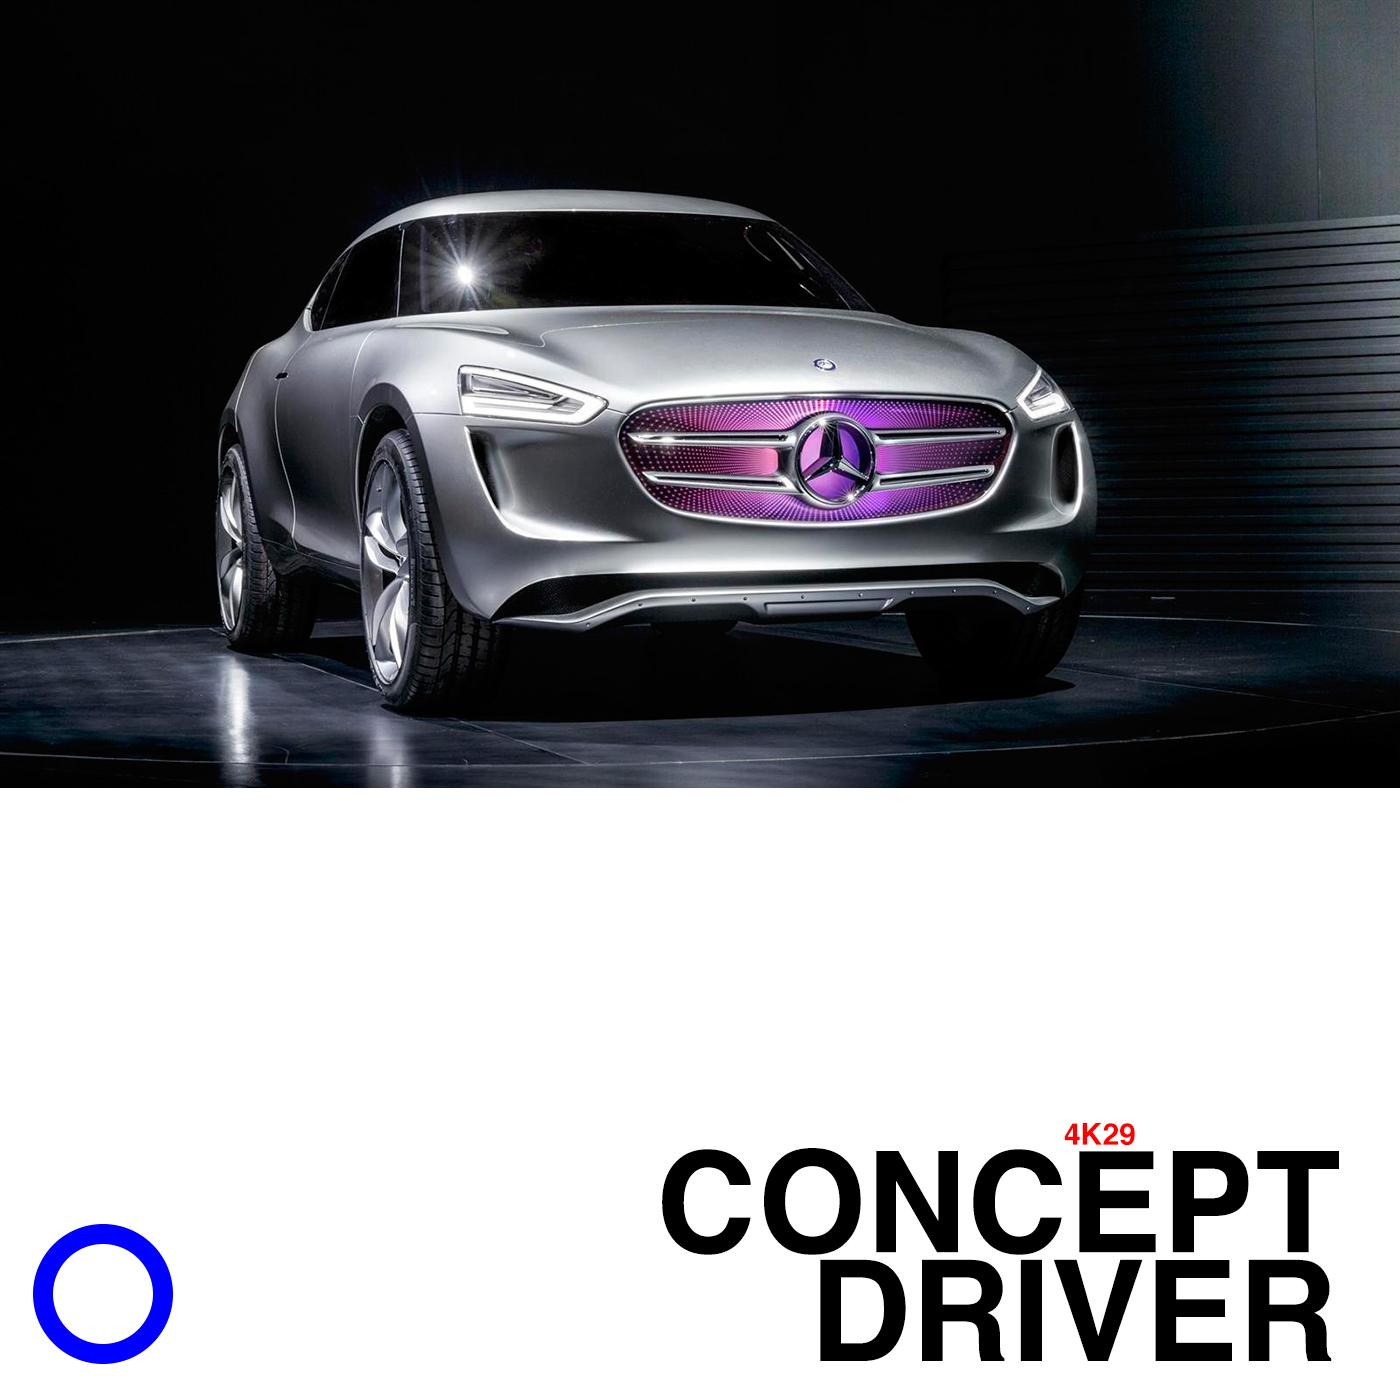 CONCEPT DRIVER 4K29 MOBILE640